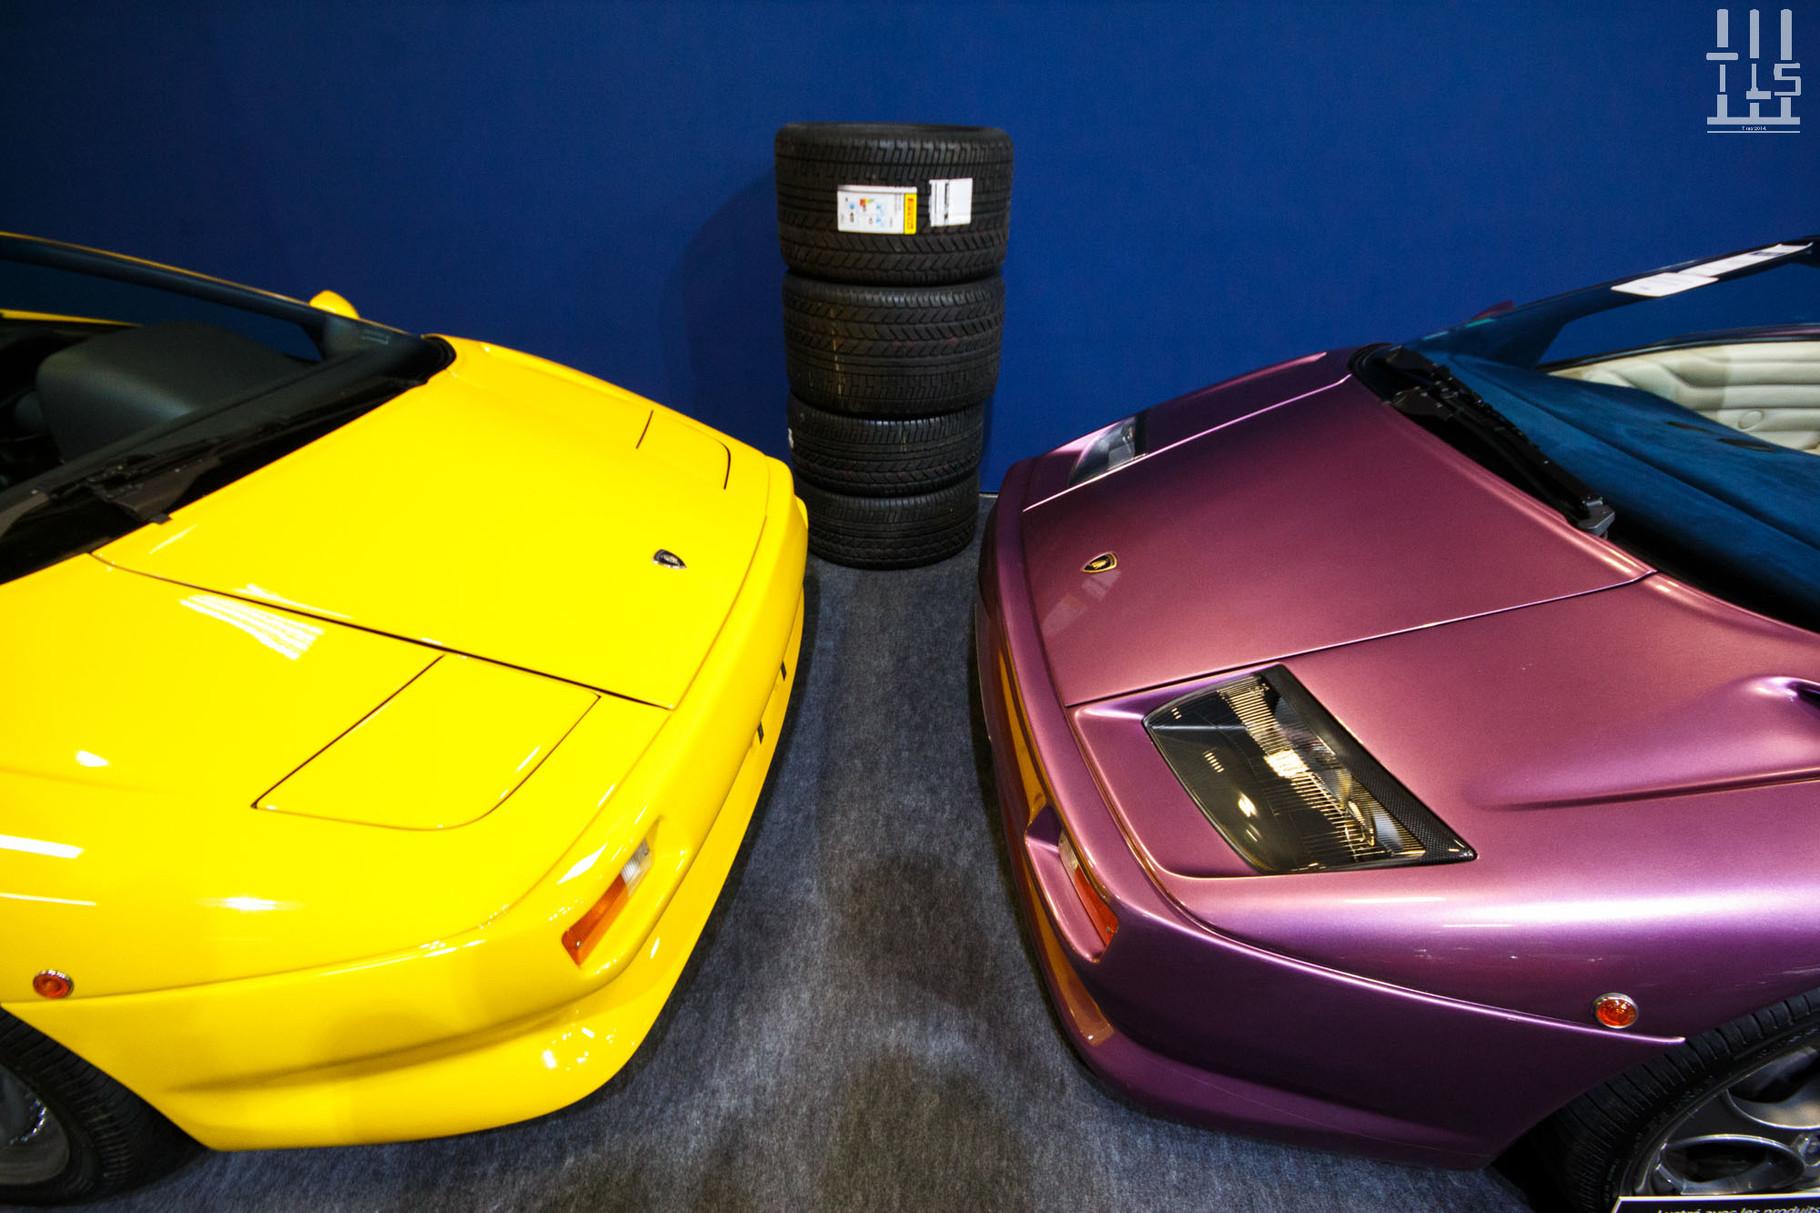 Lamborghini Diablo VT, Lamborghini Diablo Roadster.